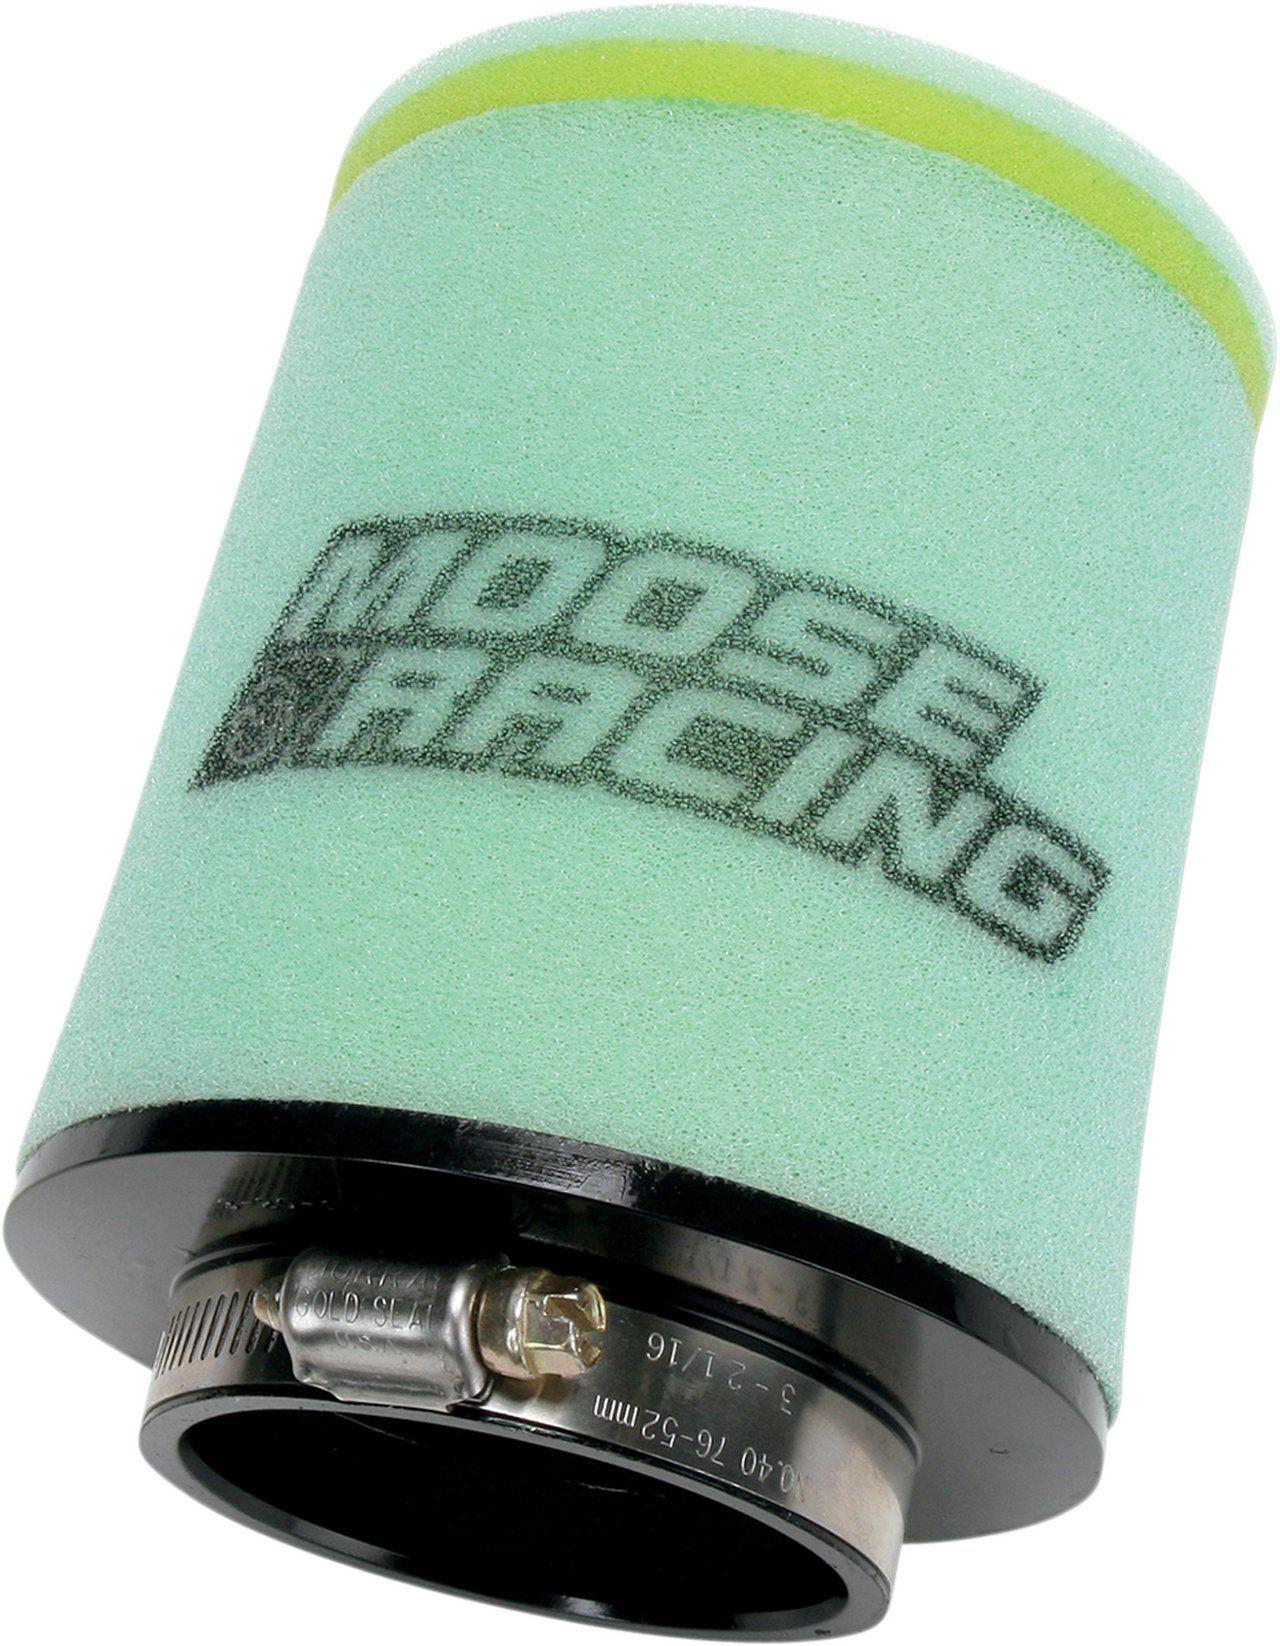 【MOOSE RACING】PPO (PRECISION PRE-OILED) 空氣濾芯 [1011-1136] - 「Webike-摩托百貨」